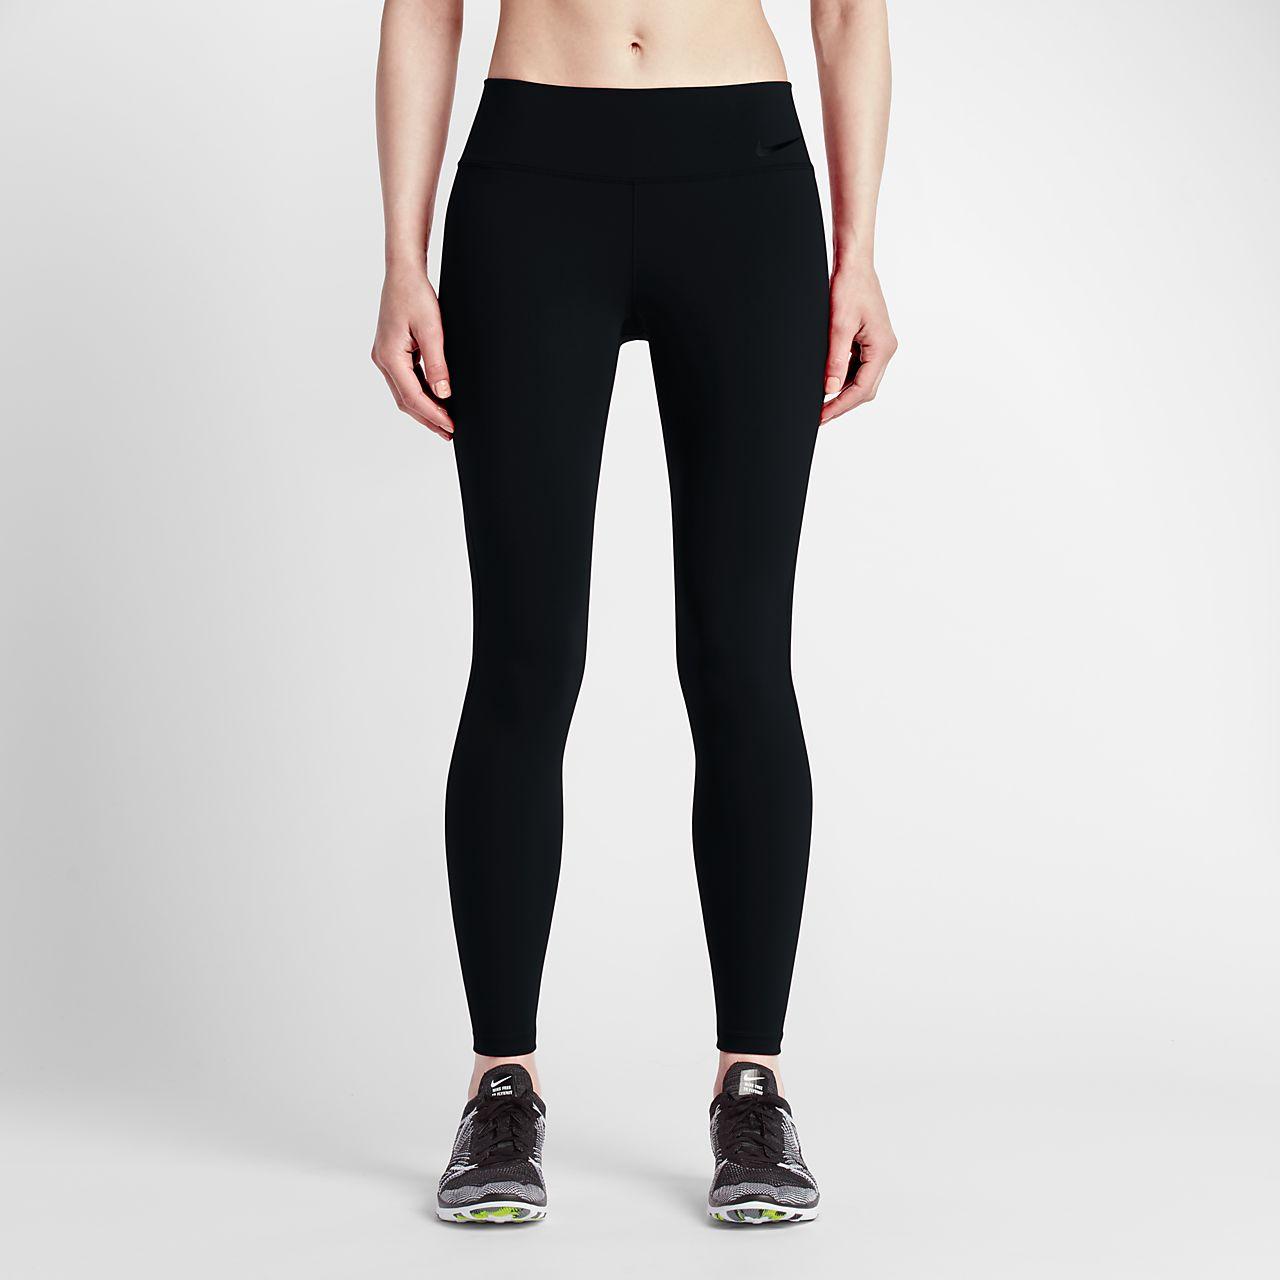 Nike Power Legendary Women's Mid Rise Training Tights Black